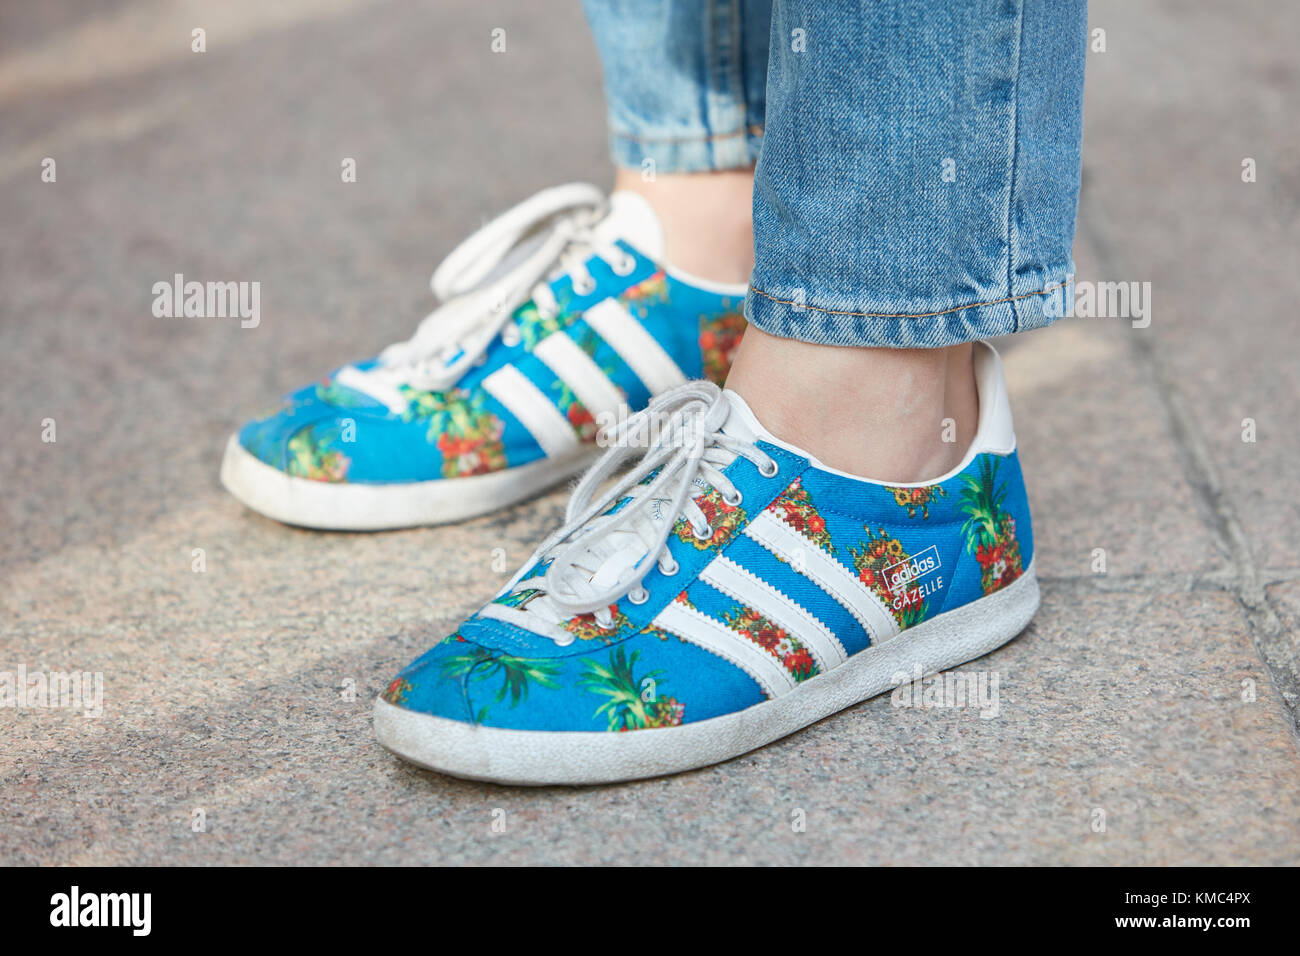 adidas scarpe fashion style